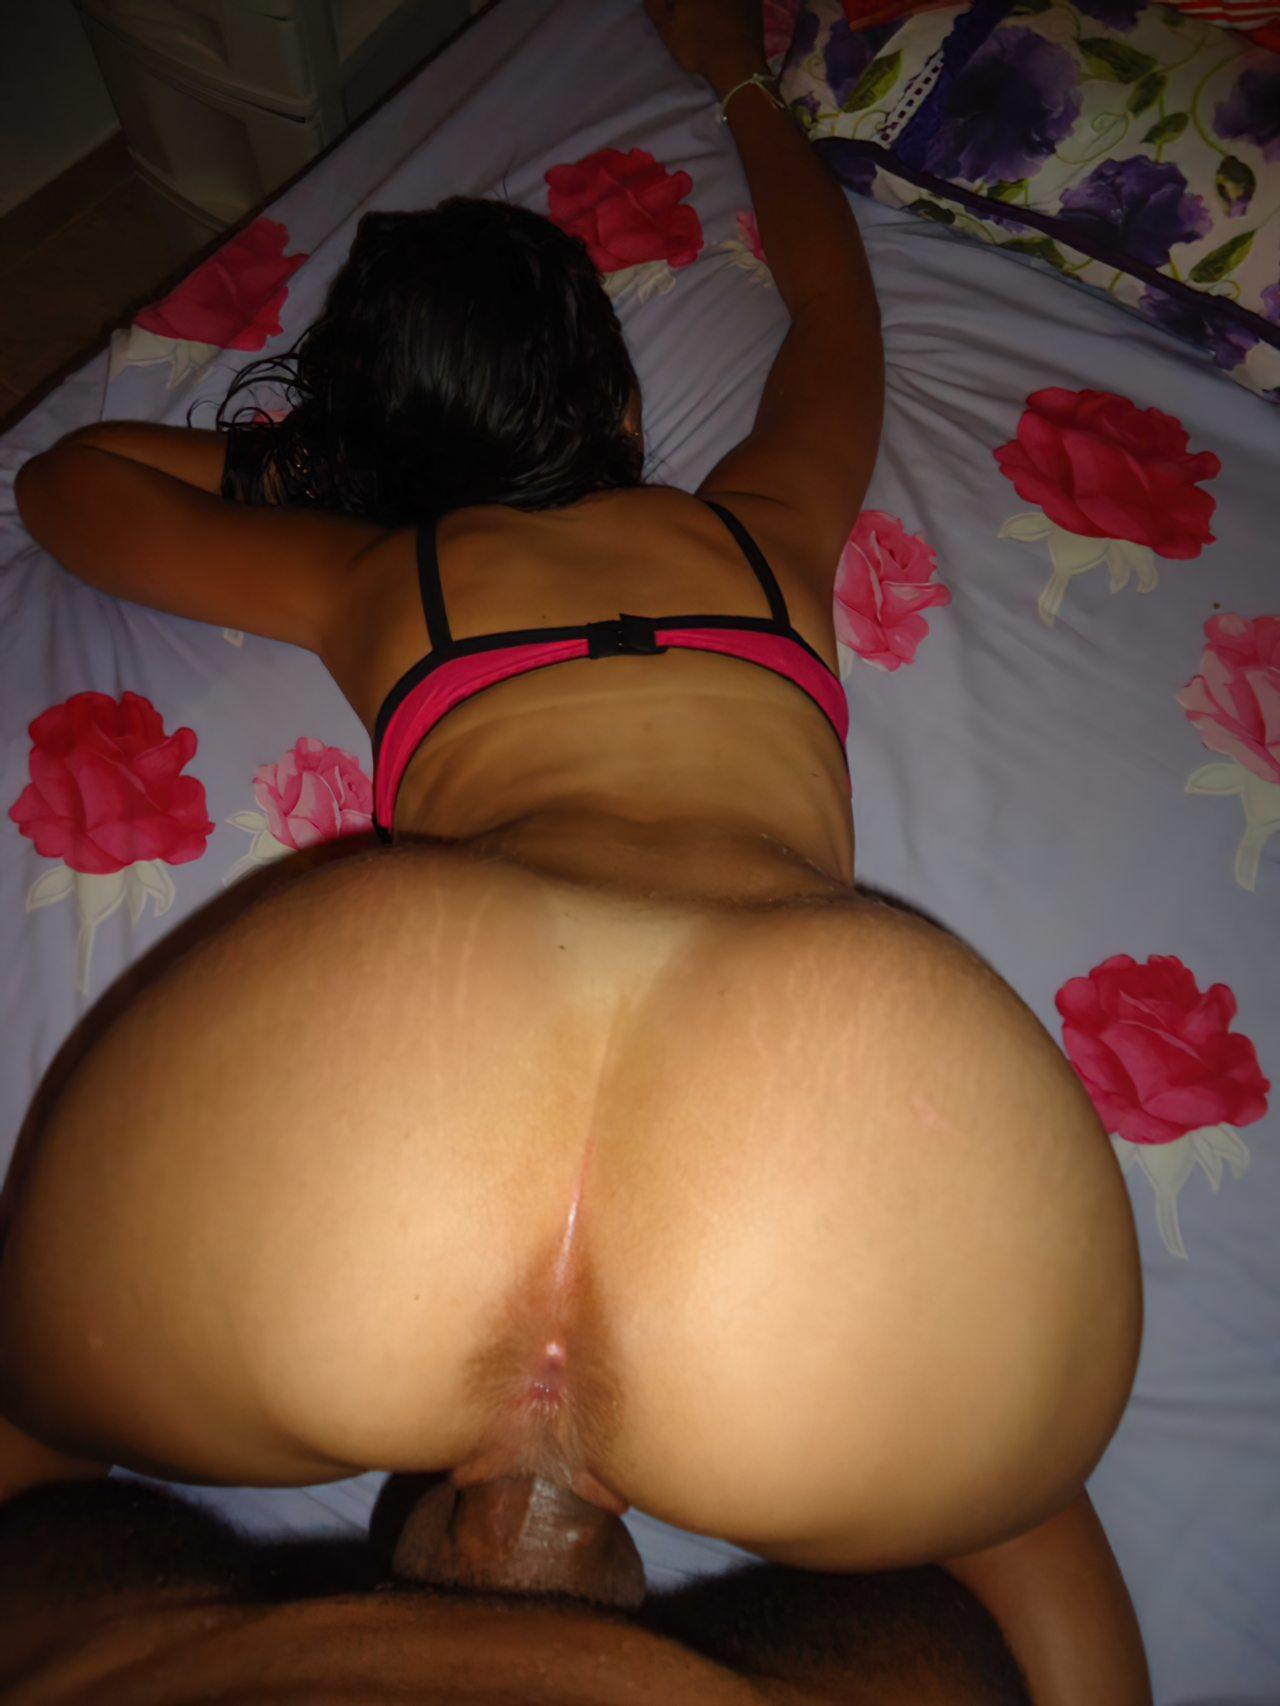 bunduda numeros de putas venezuela